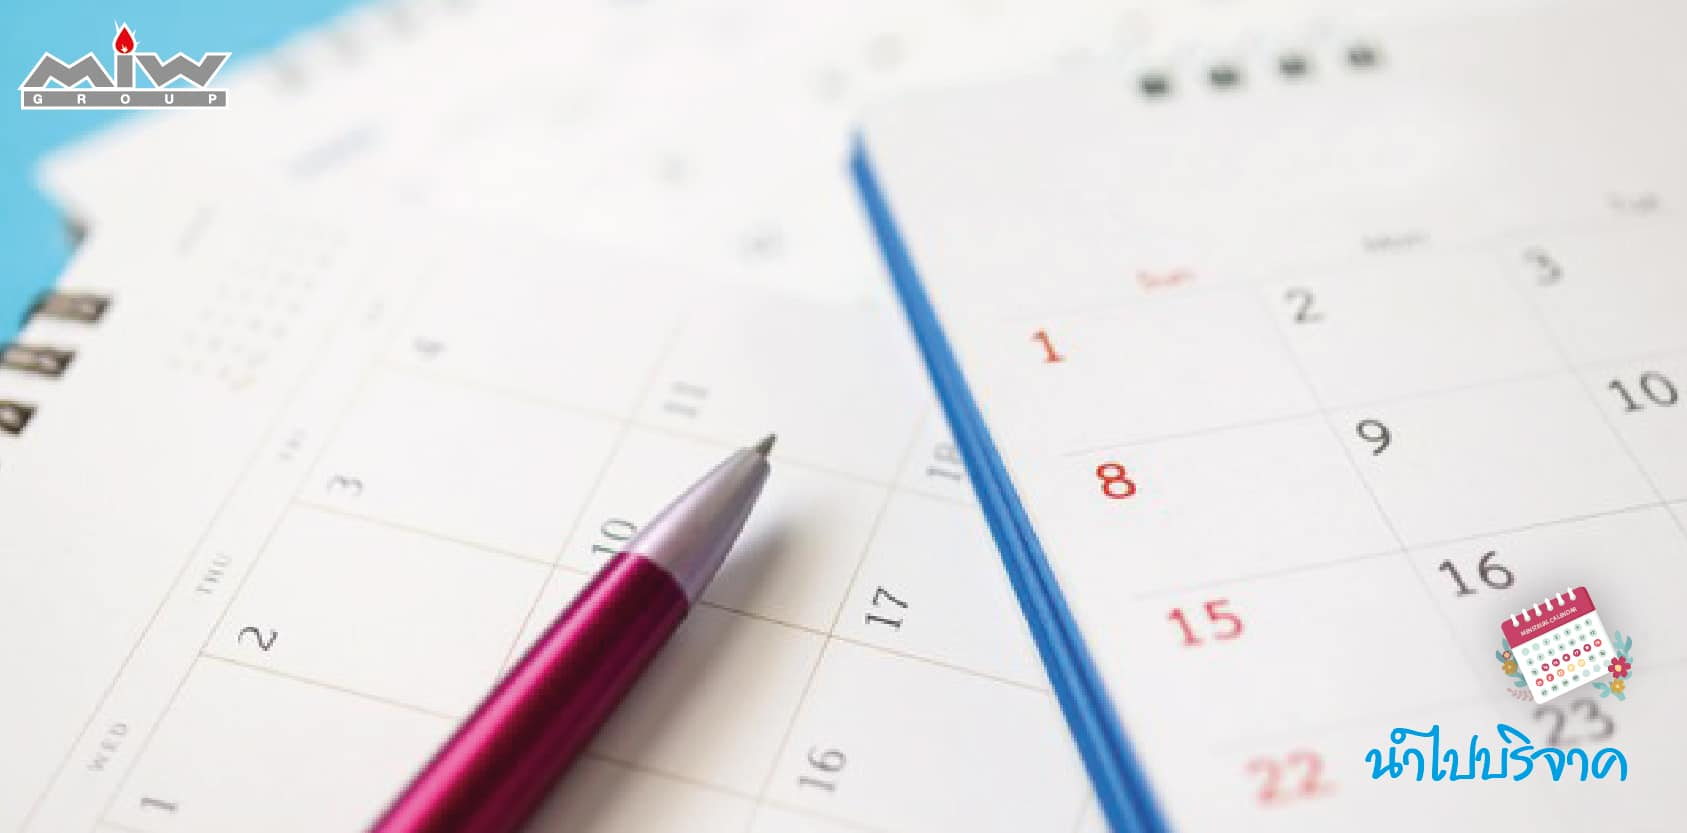 Old calendar 01 - 5 ประโยชน์จากปฏิทินเก่า ที่นำกลับมาใช้ได้อีกครั้ง !